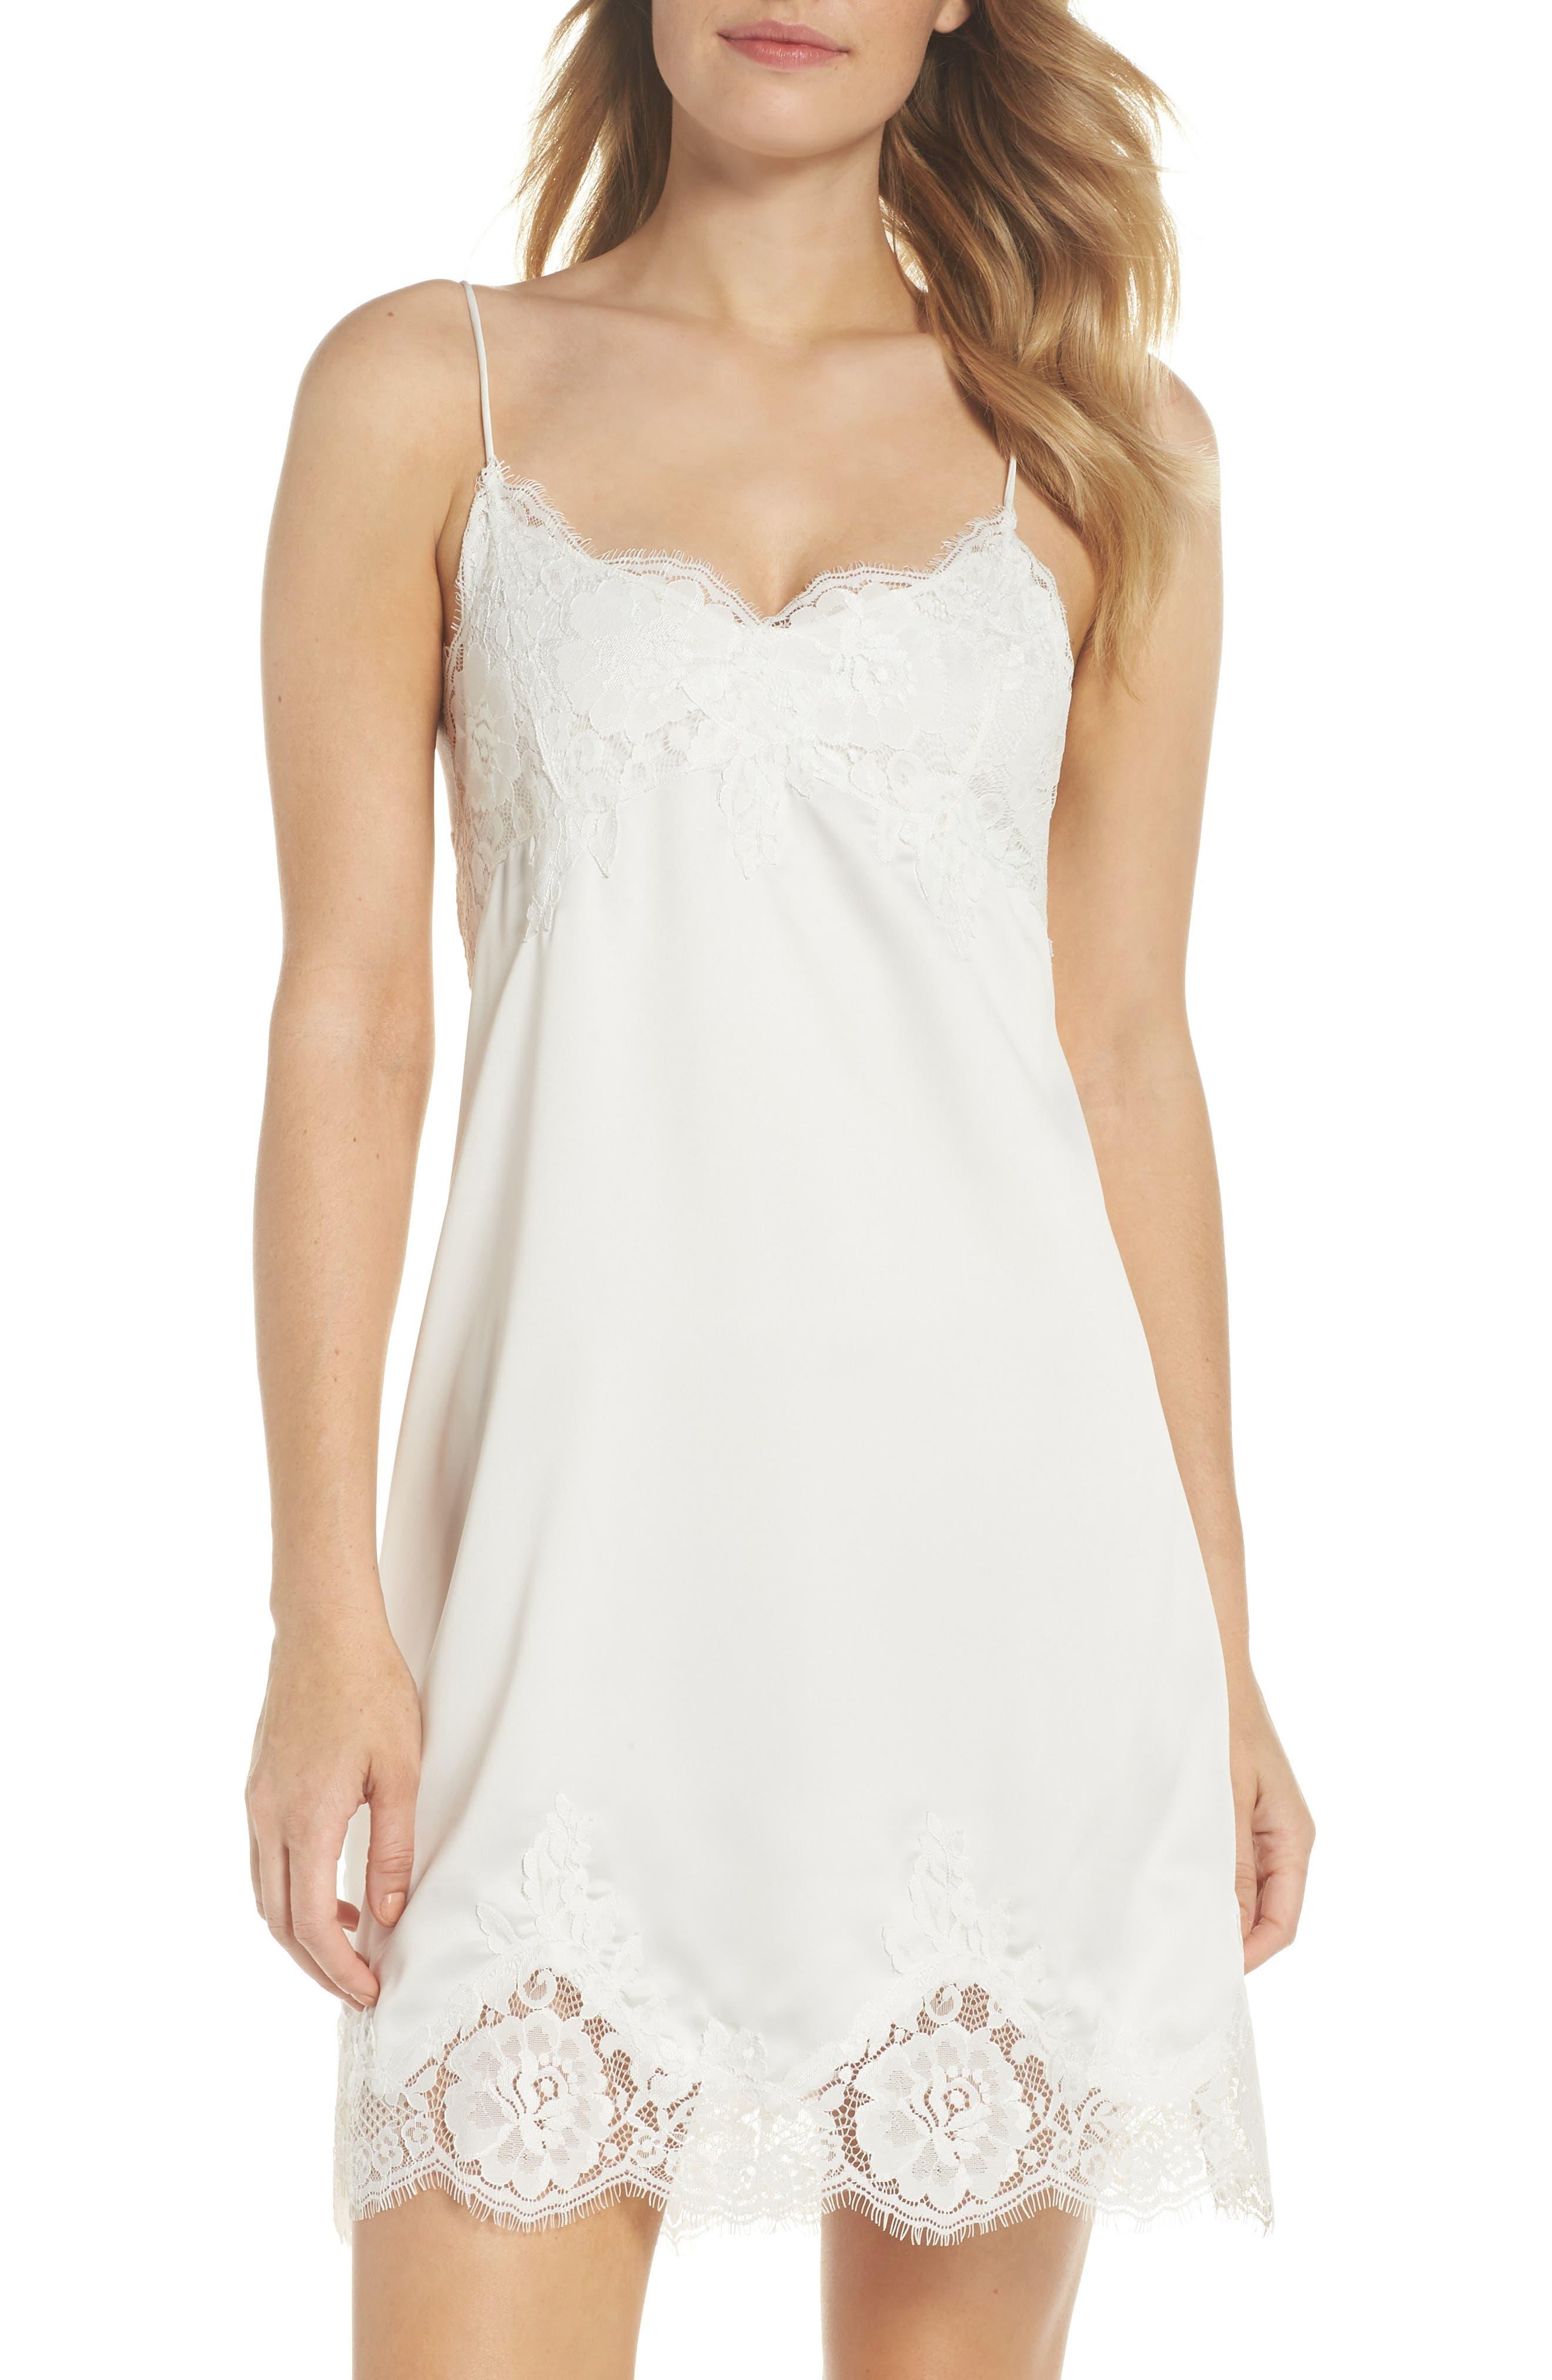 Olivia Chemise,                         Main,                         color, White